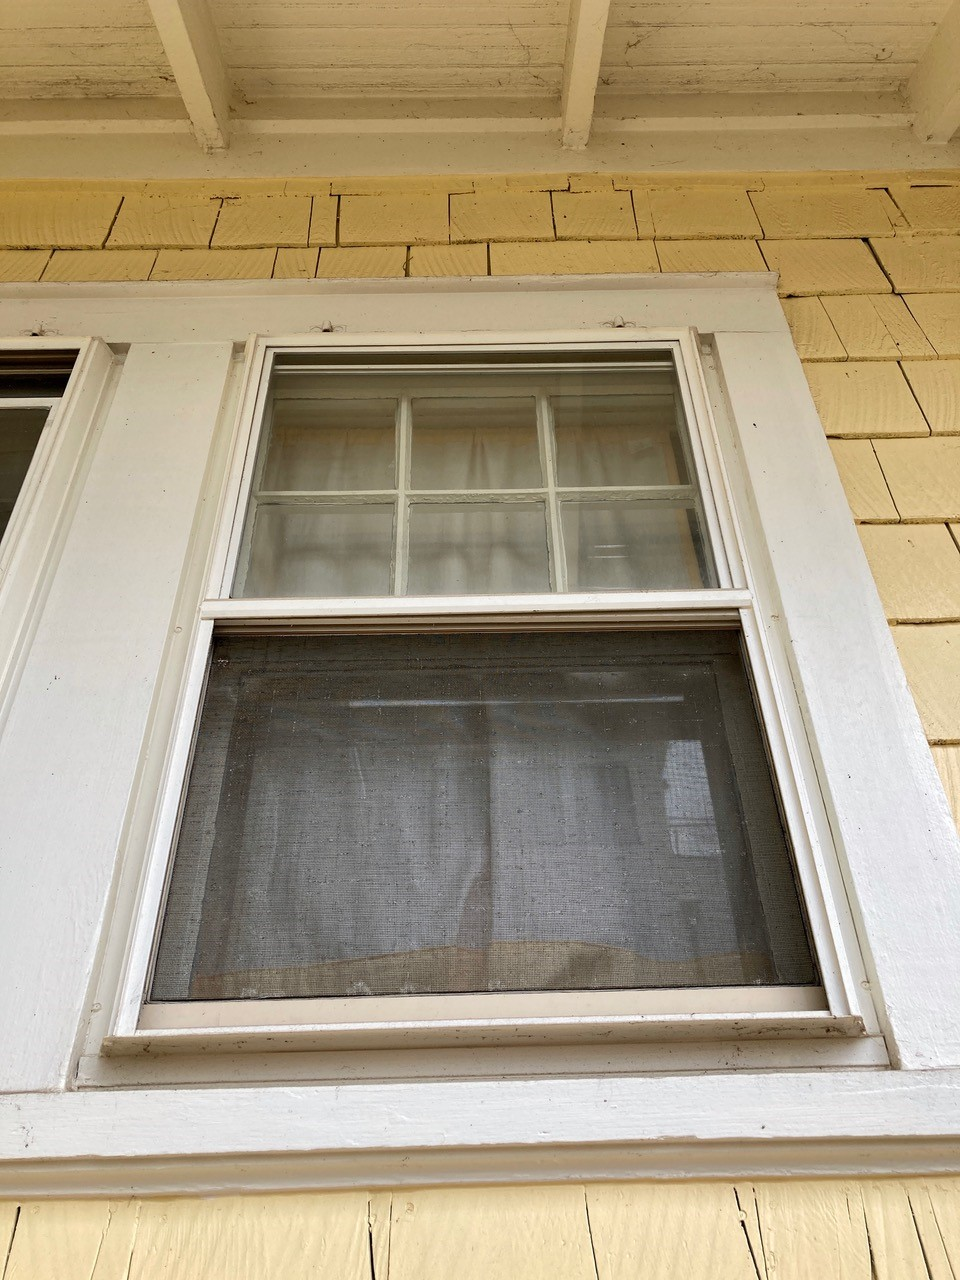 Carin's triple-track windows